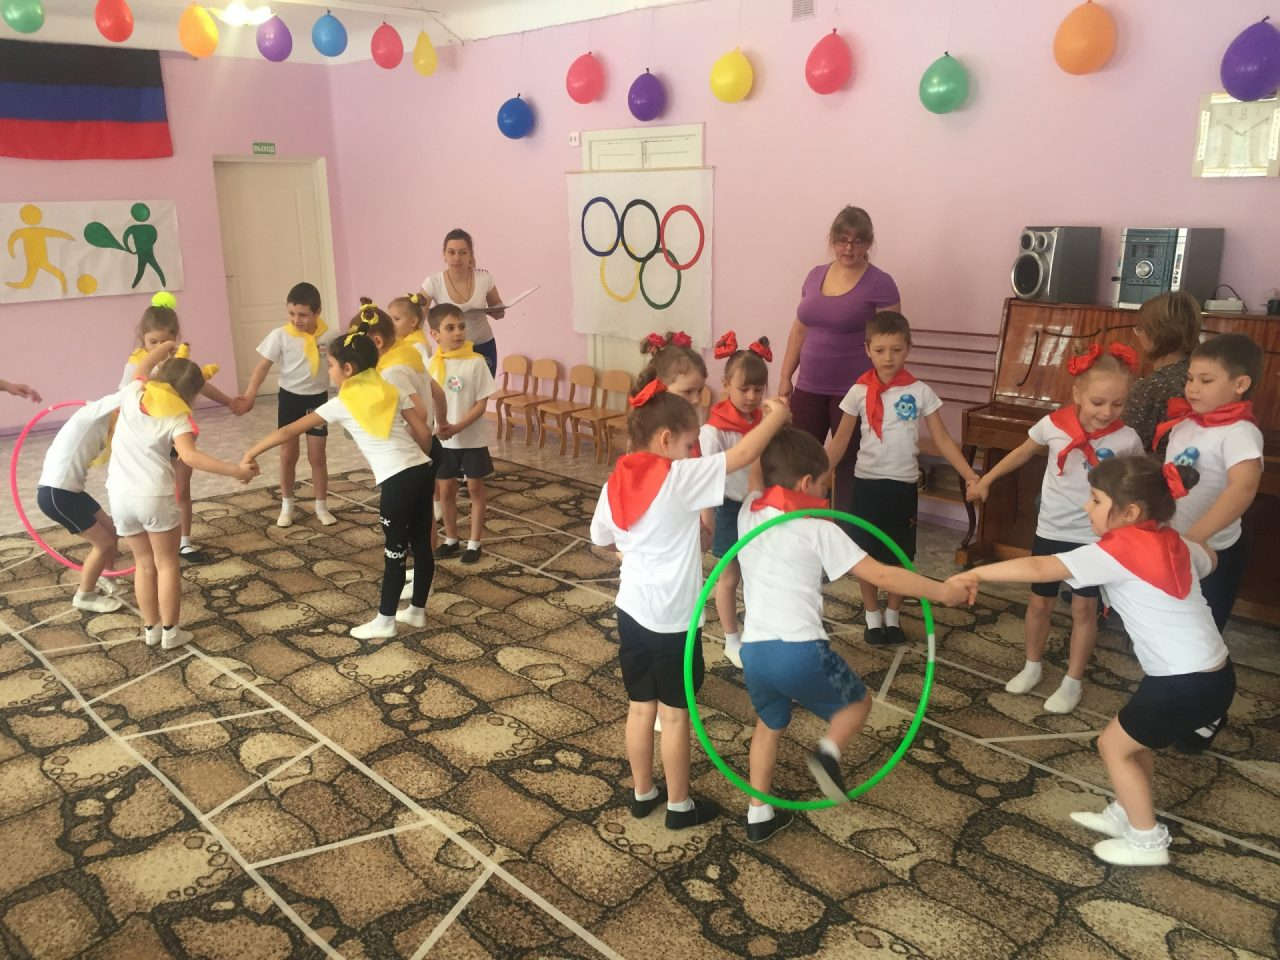 malie-olimpijskie-igri-mdou-12-1